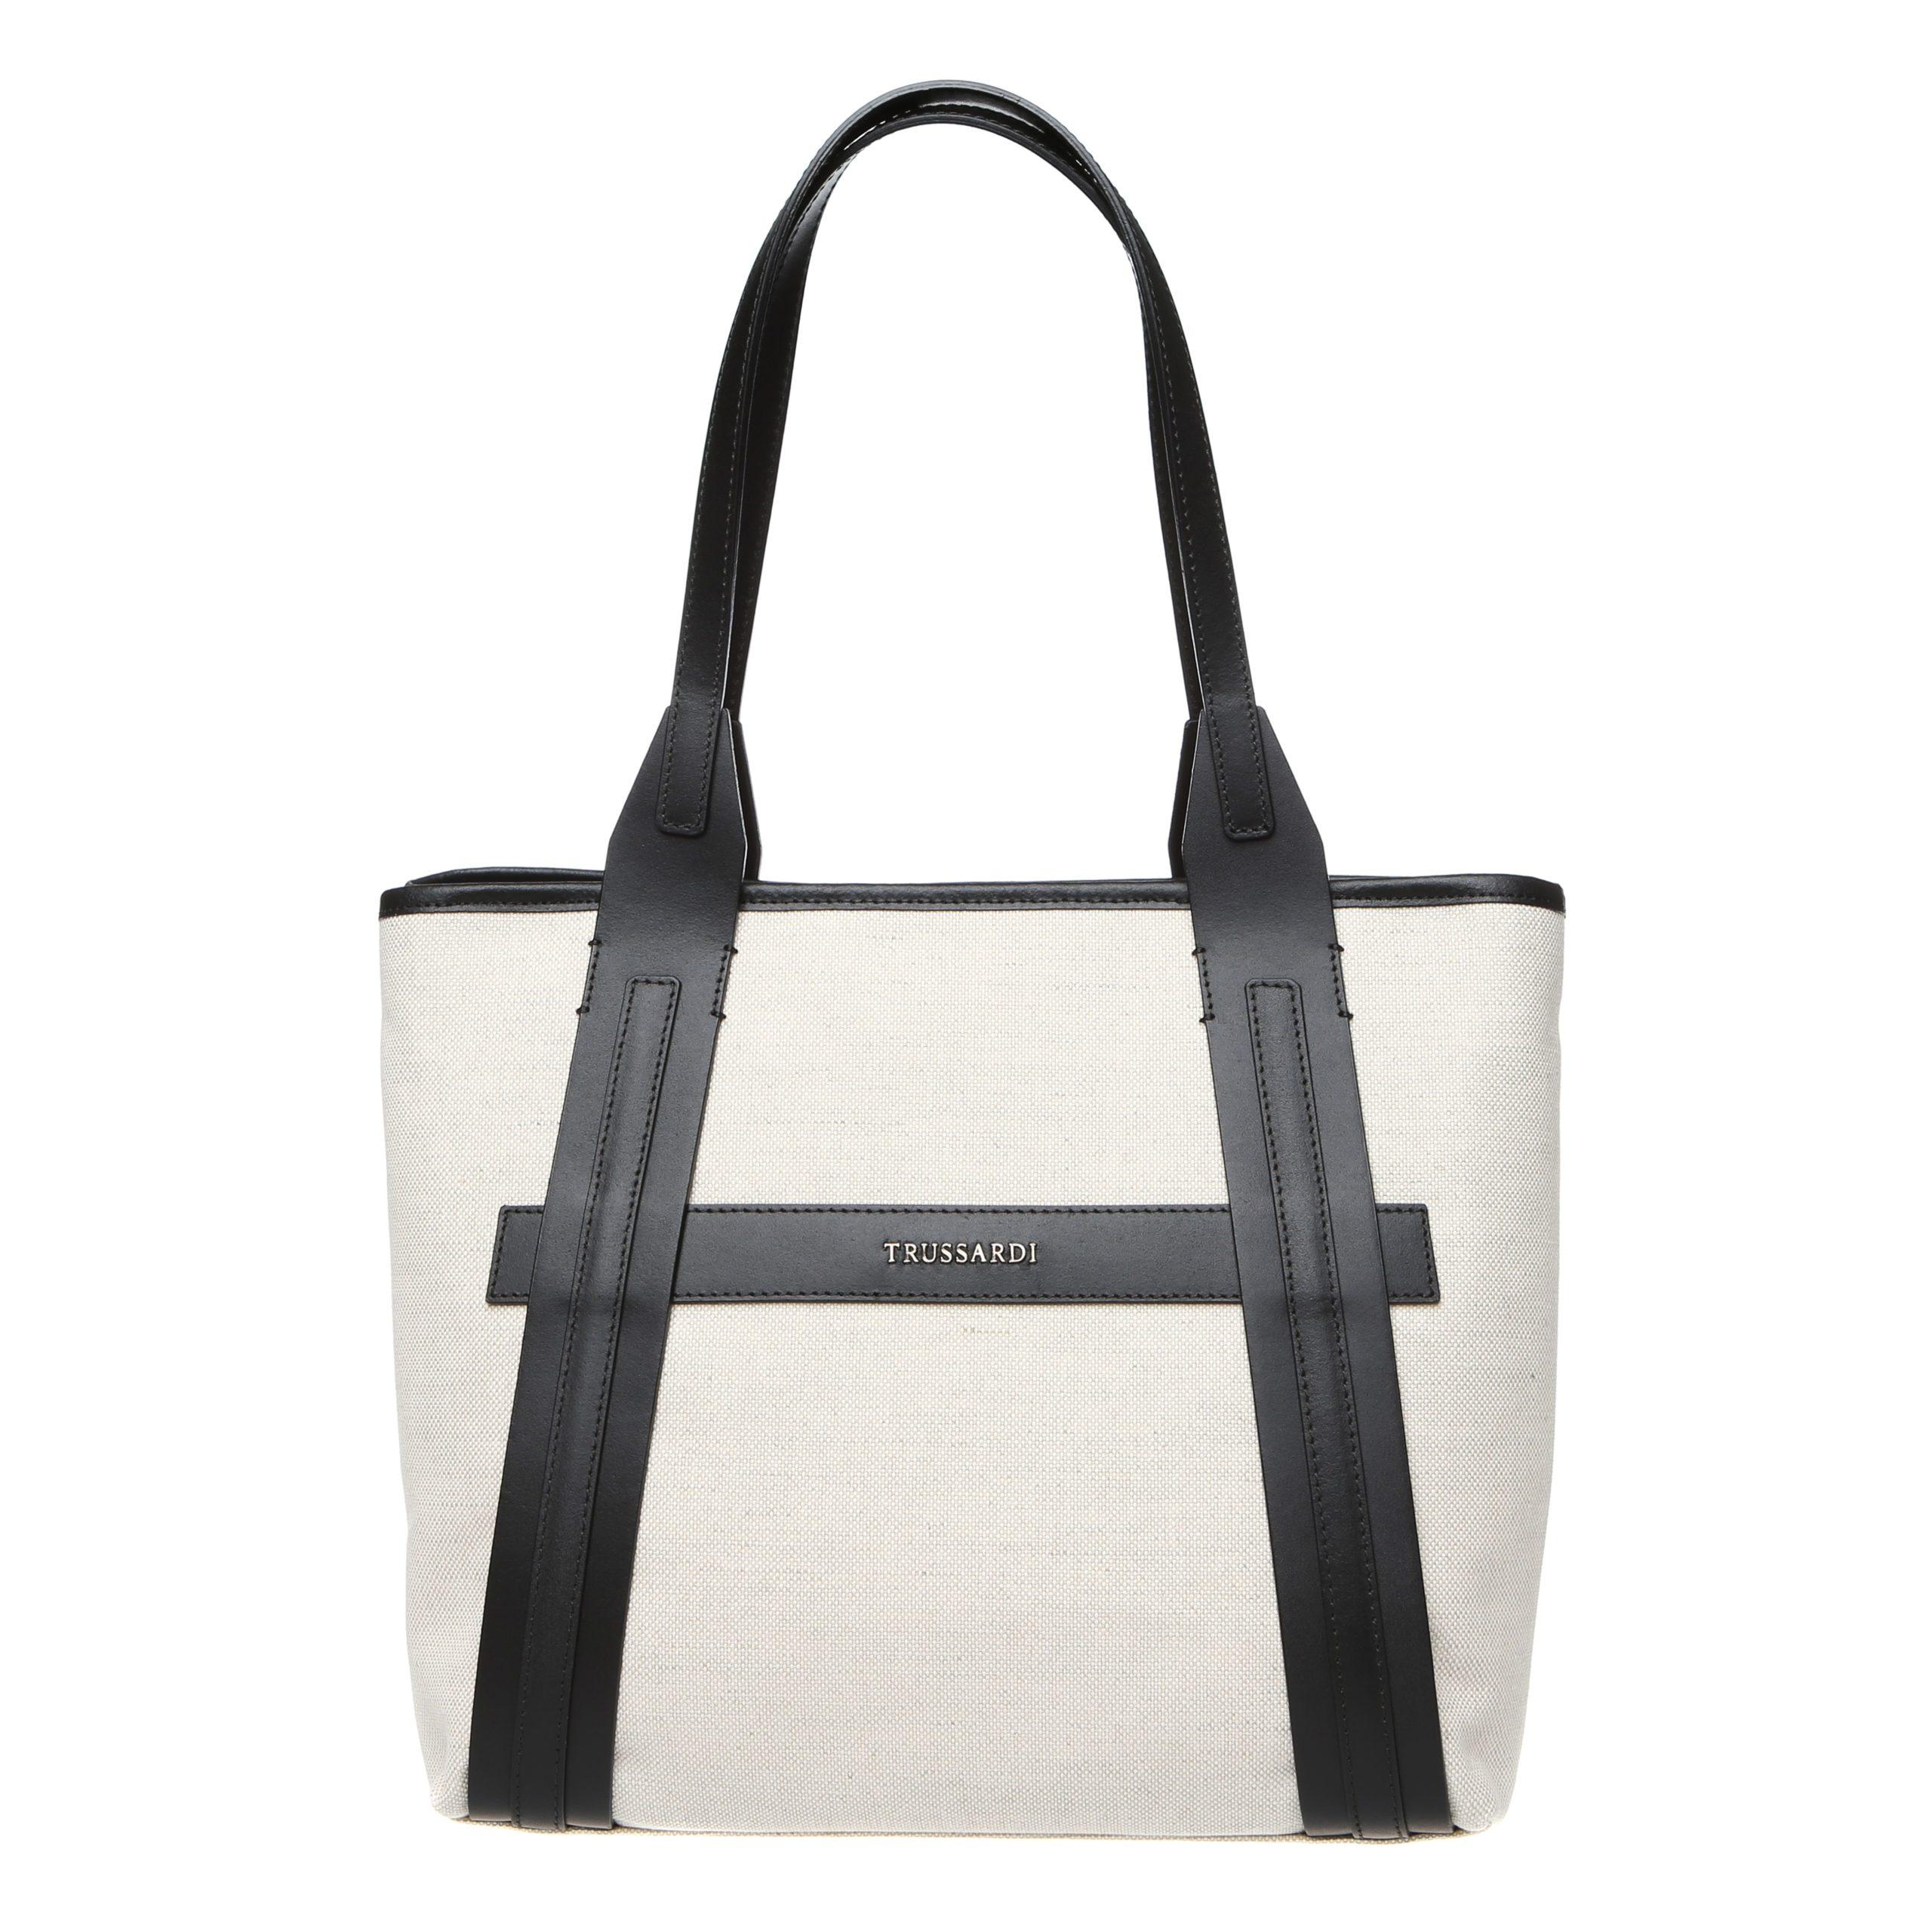 Trussardi Women's Shoulder Bag White 76B120M_119Natural-Black